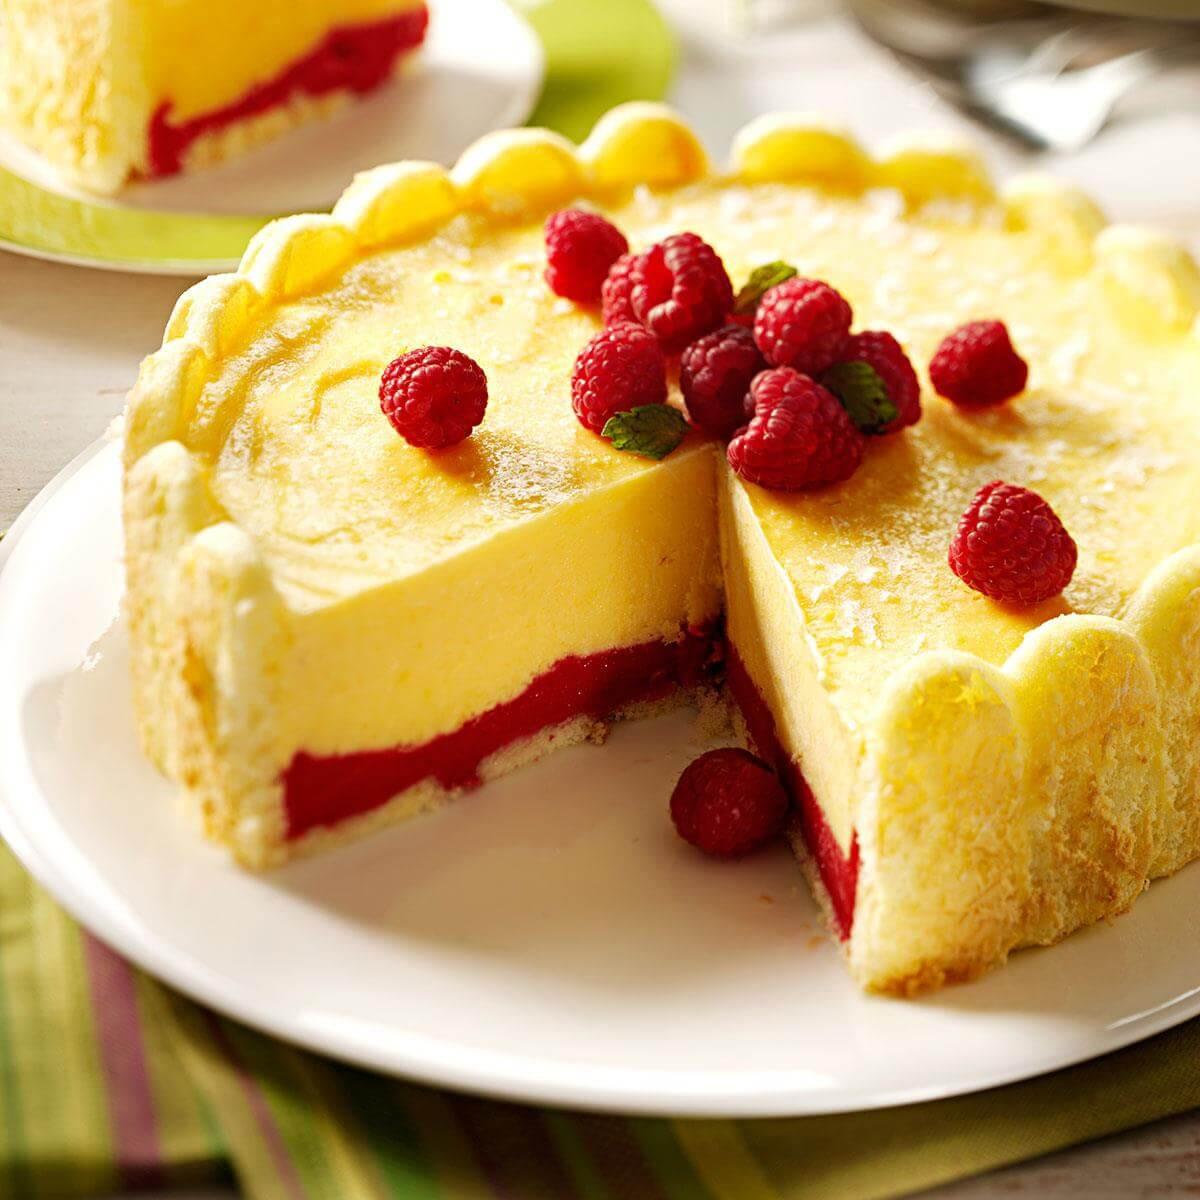 Lady Finger Dessert Recipes  Eggnog Ladyfinger Dessert Recipe